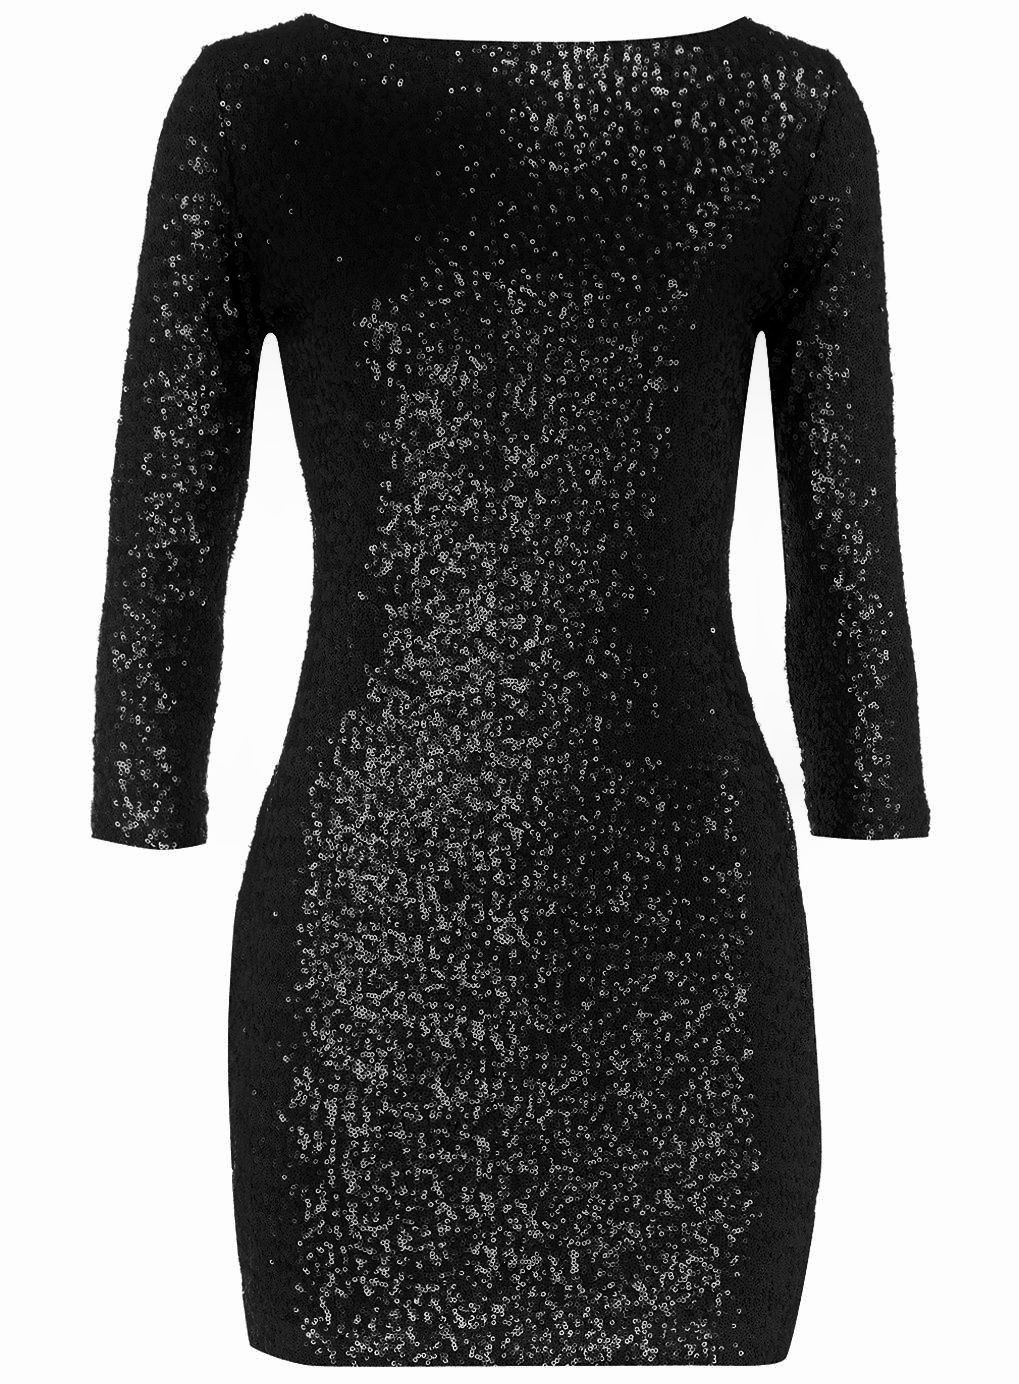 Black Sequin Dress Photo Album - Reikian